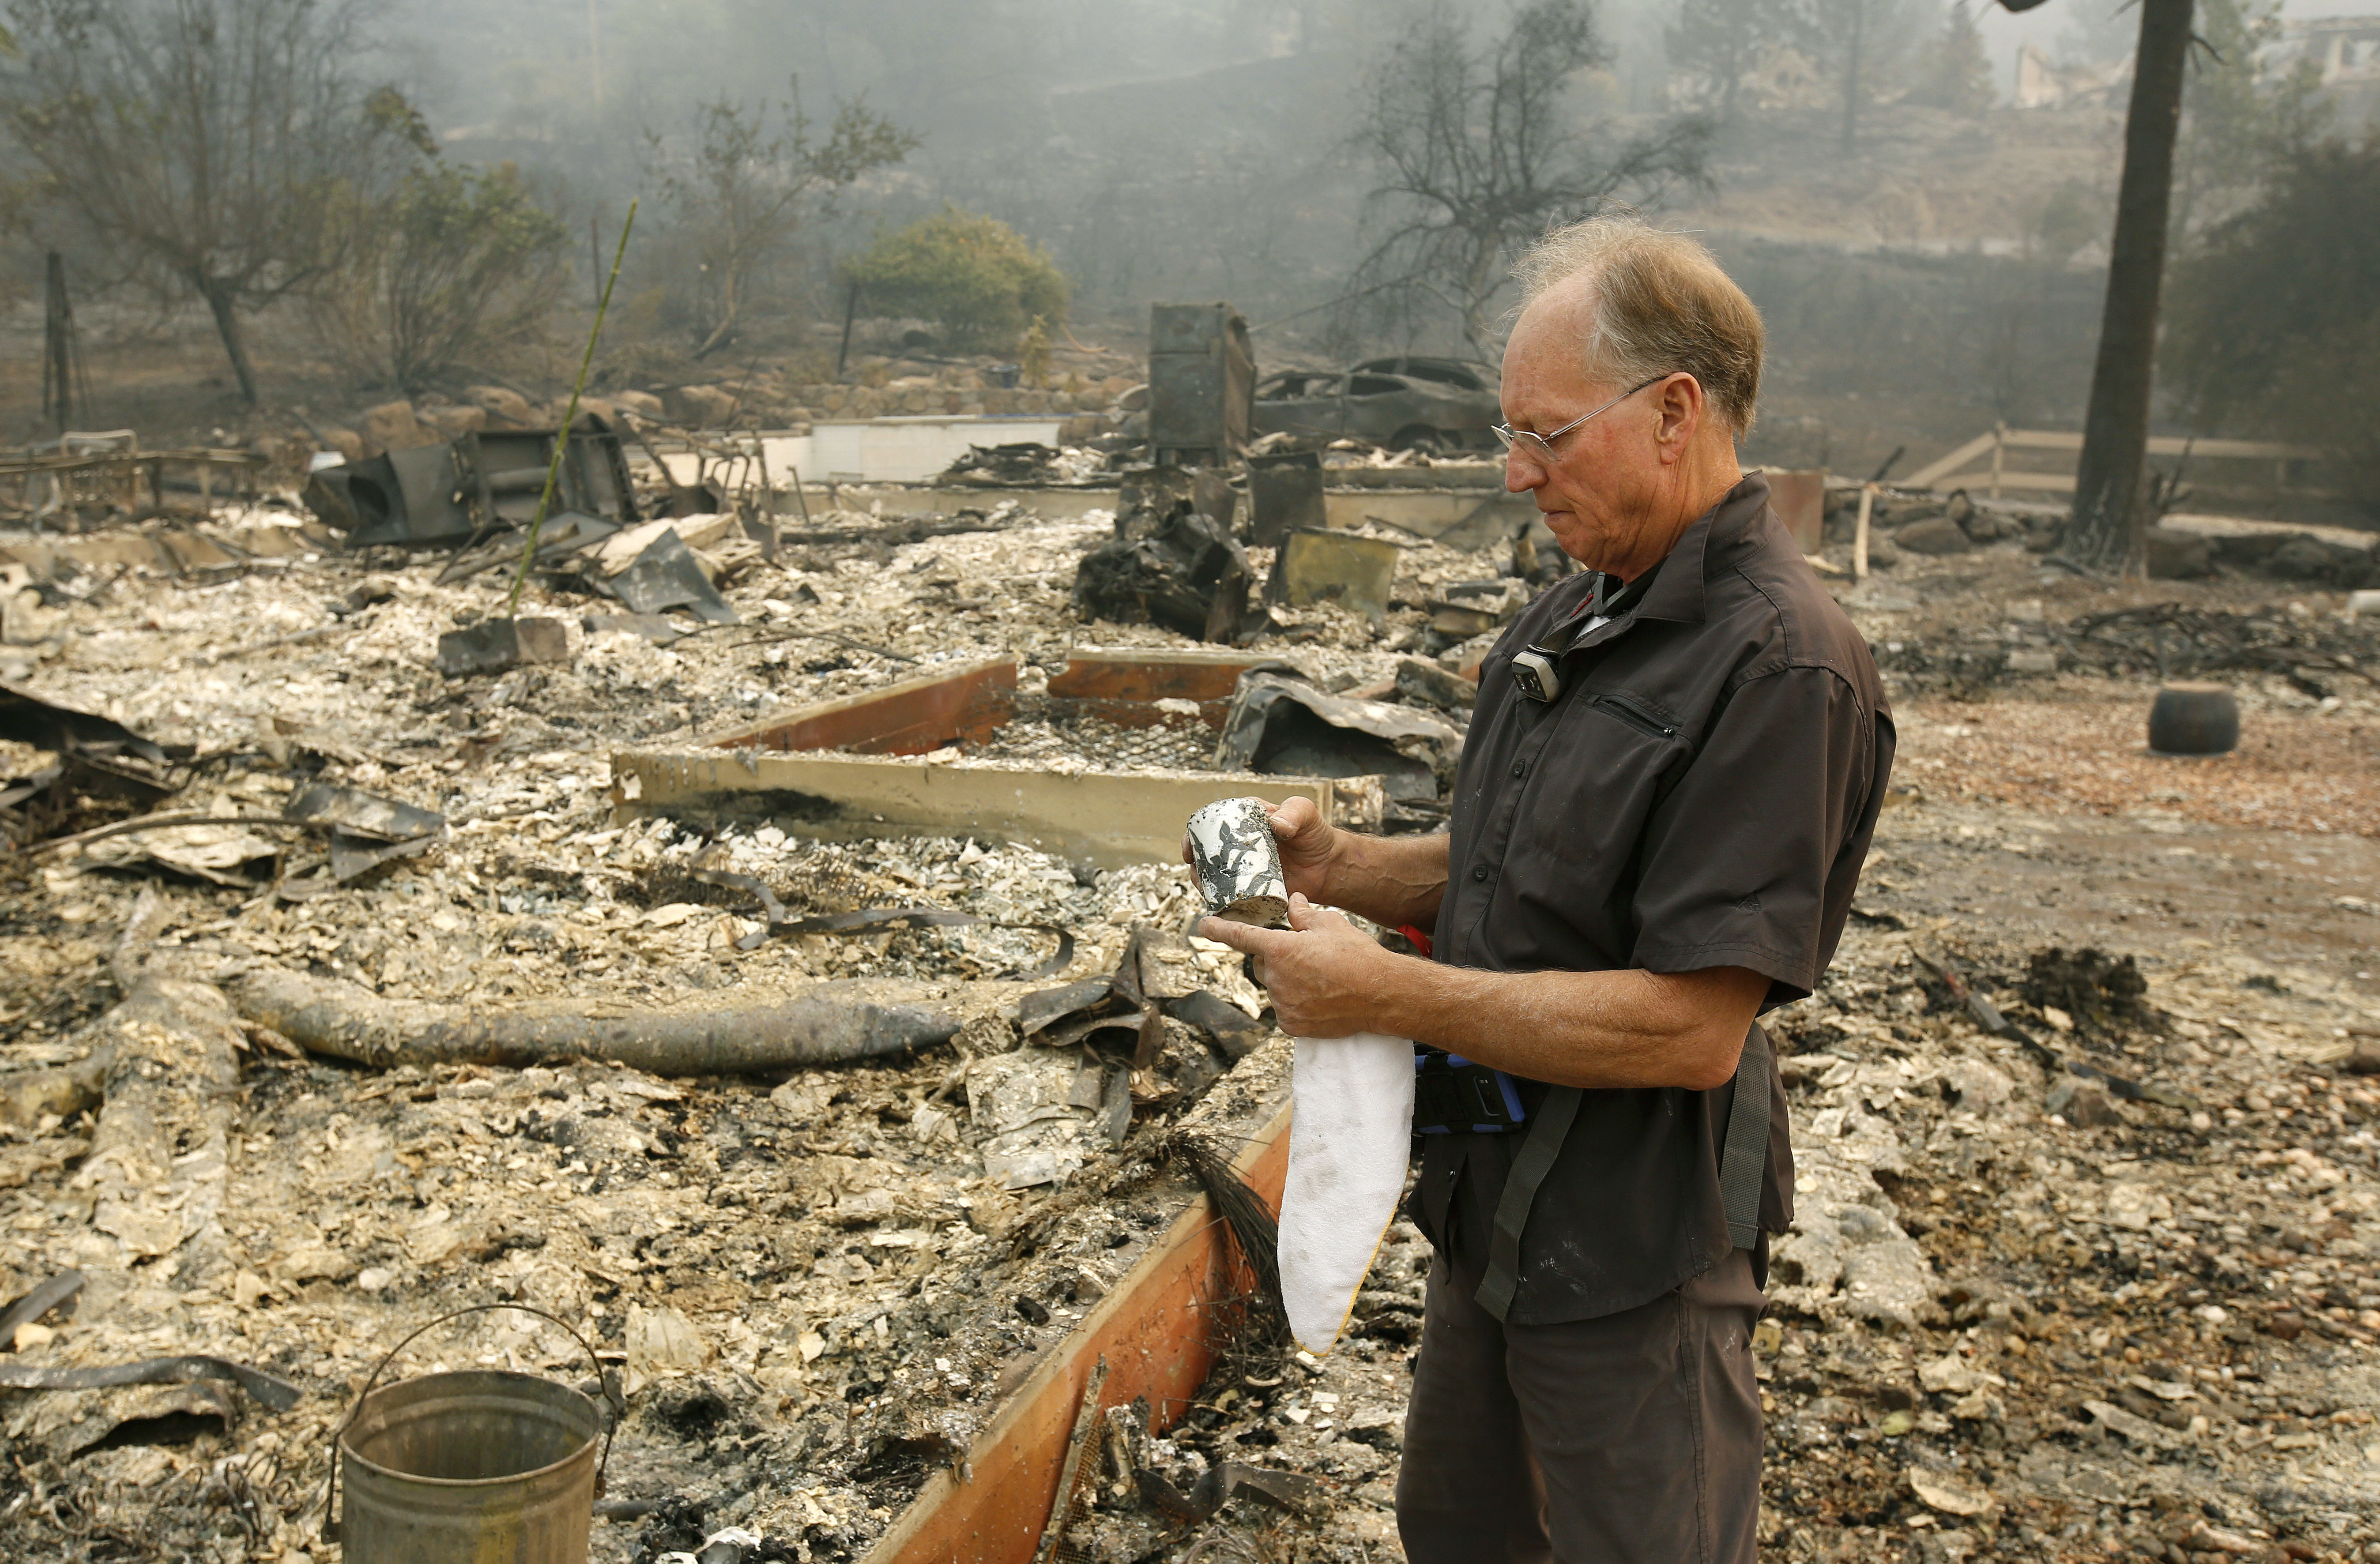 Chuck Rippey看著爸媽的家已成灰燼,手拿著爸媽的杯子不勝唏噓, 他100歲的爸爸Charles Rippey和98歲的媽媽 Sara,在納帕這場大火中,因無法逃離而與家園同歸於「燼」。(美聯社)